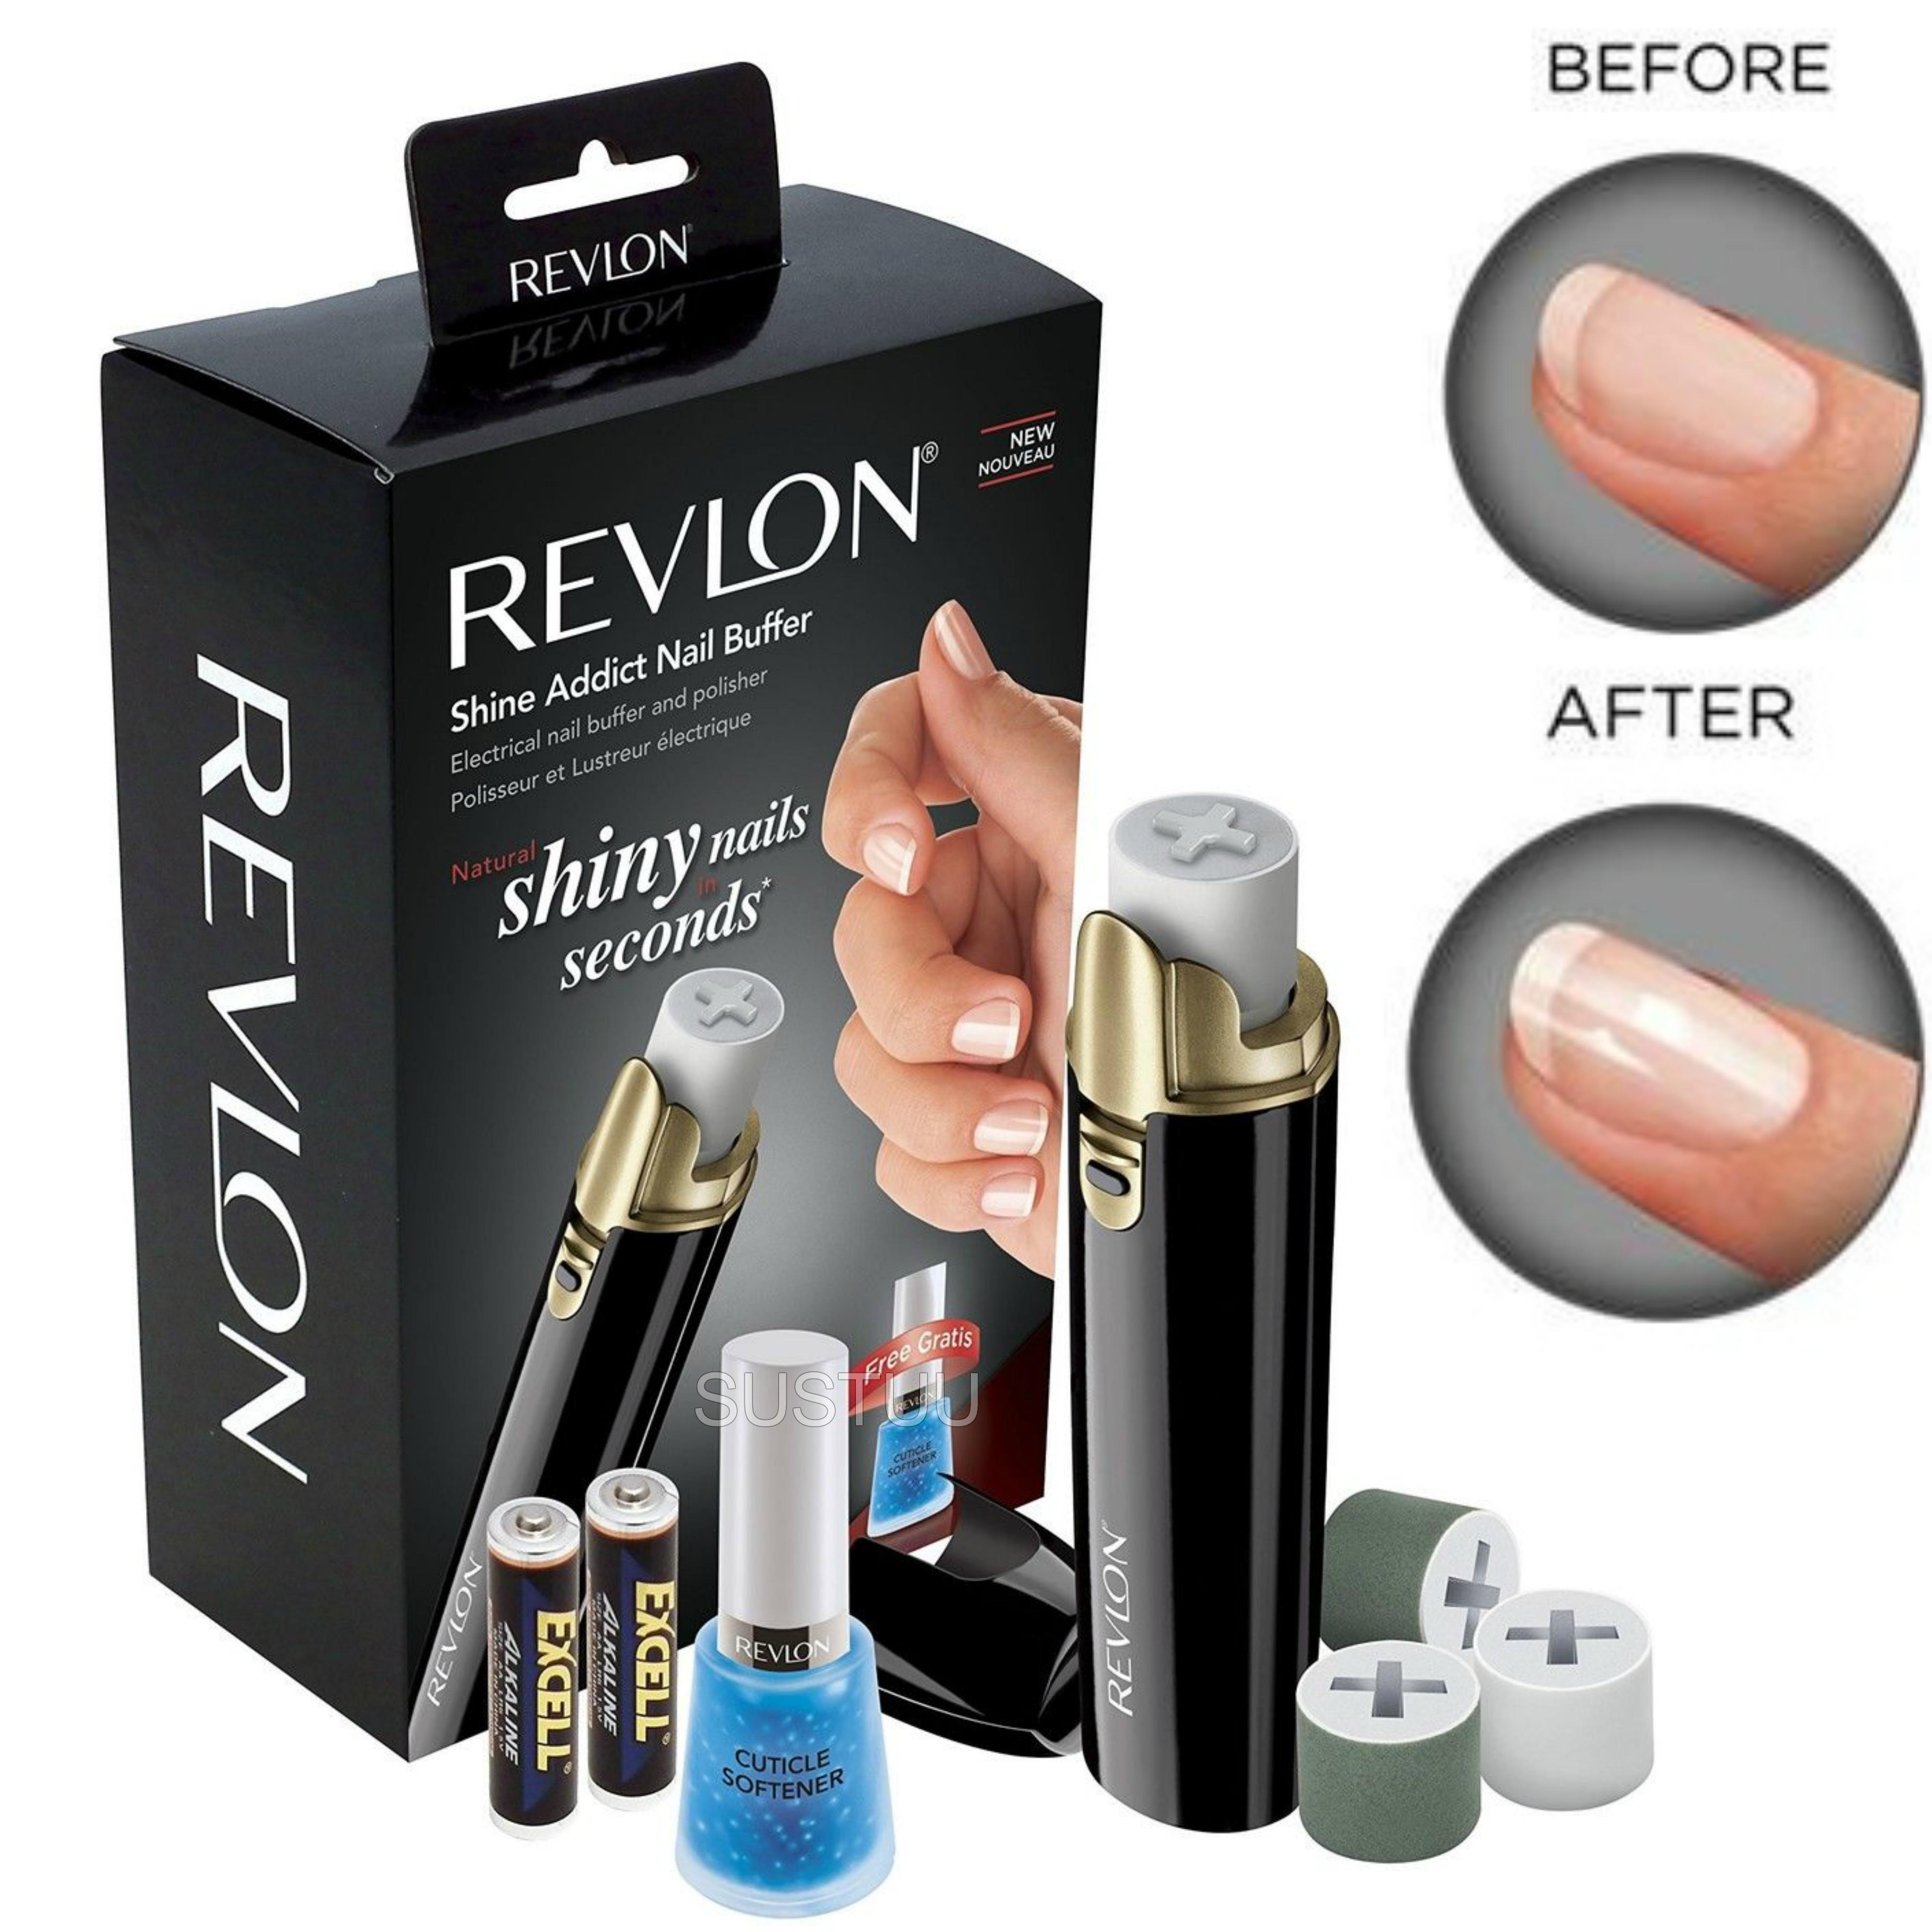 Revlon Shine Addict Electirc Nail Buffer & Polisher | Fast Manicure-Pedicure Tools